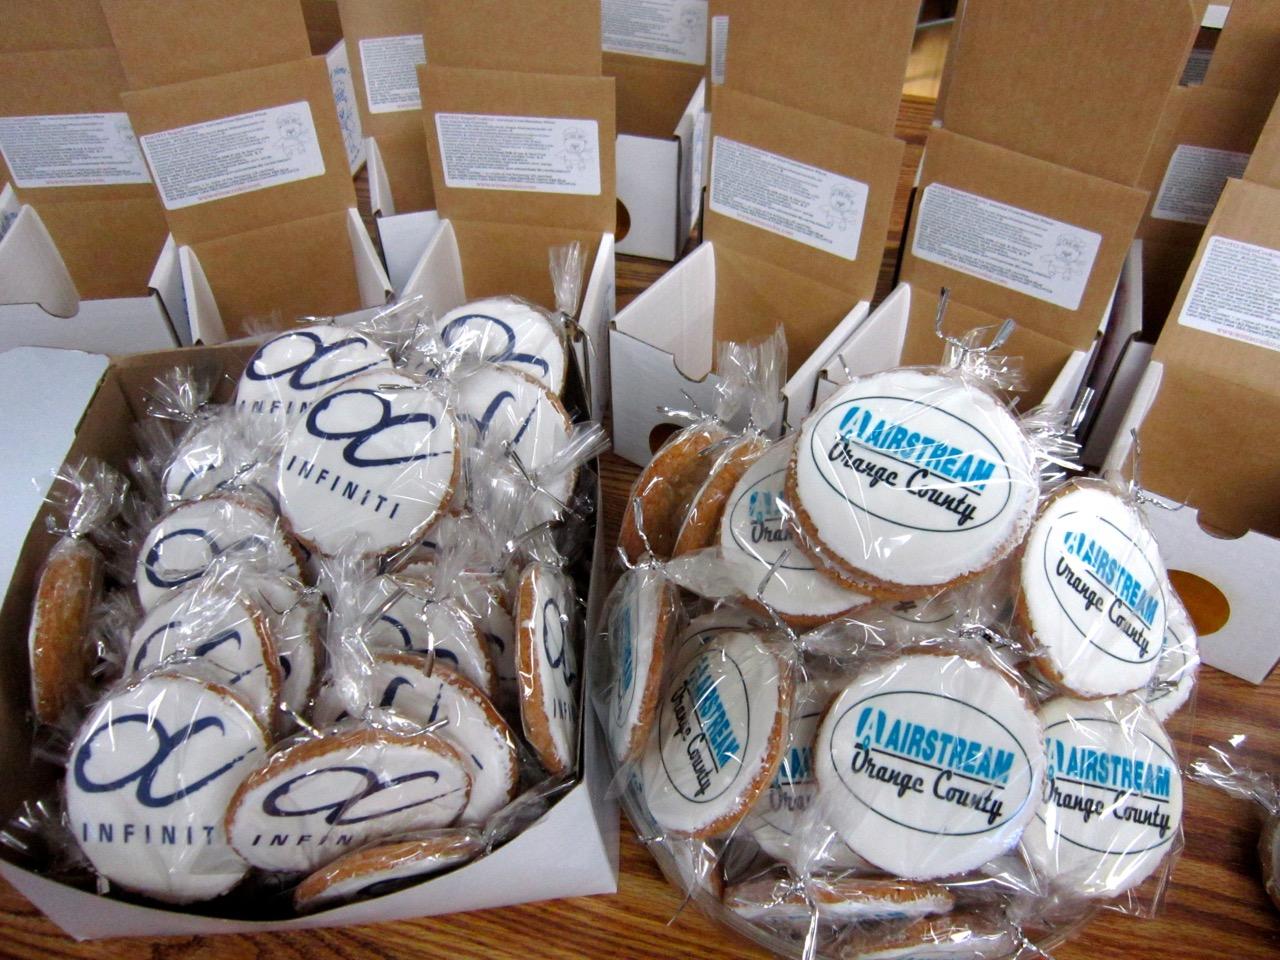 Infiniti & Airstream Cookies!